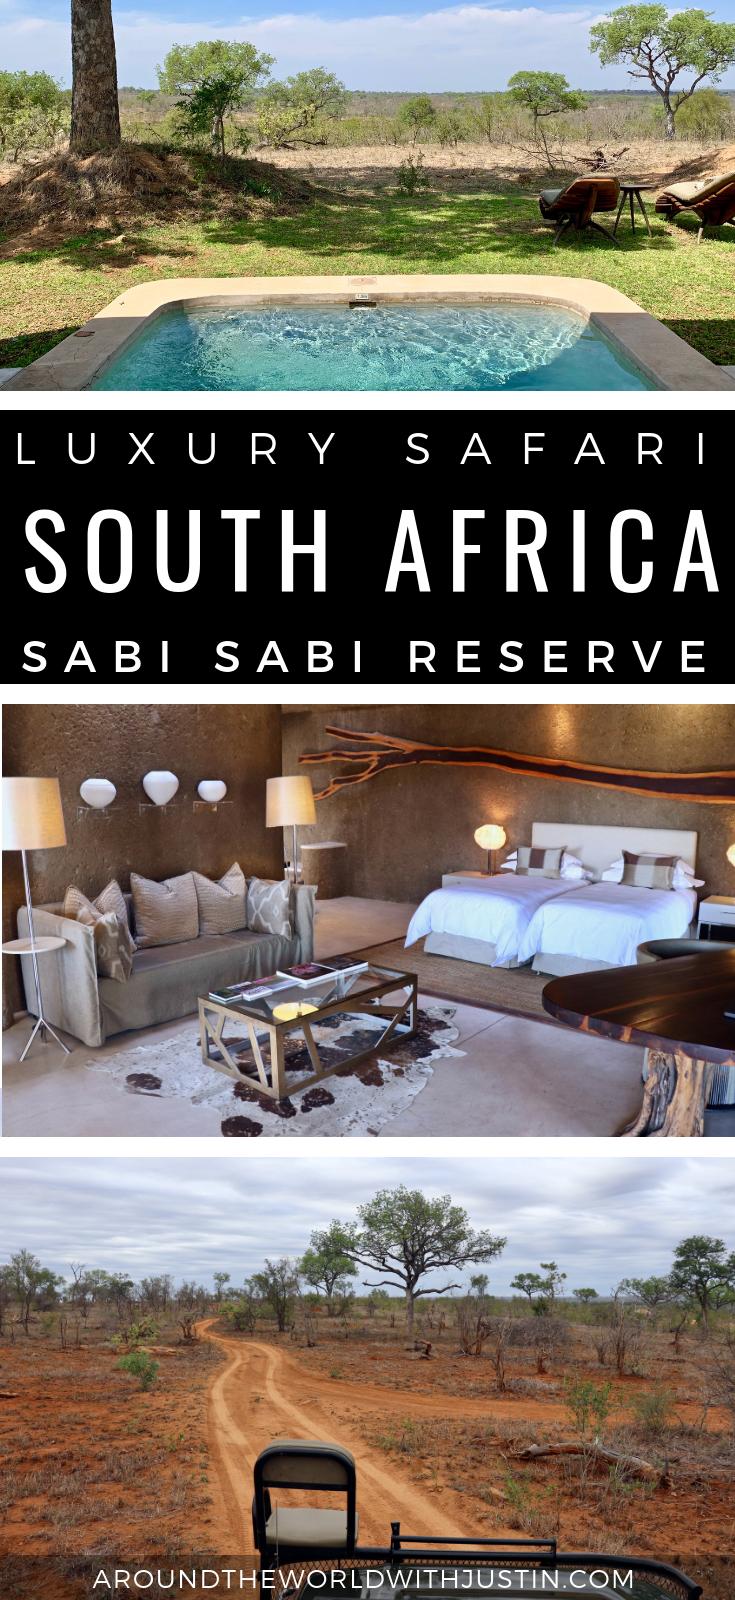 Sabi Sabi Private Game Reserve South Africa Luxury Safari